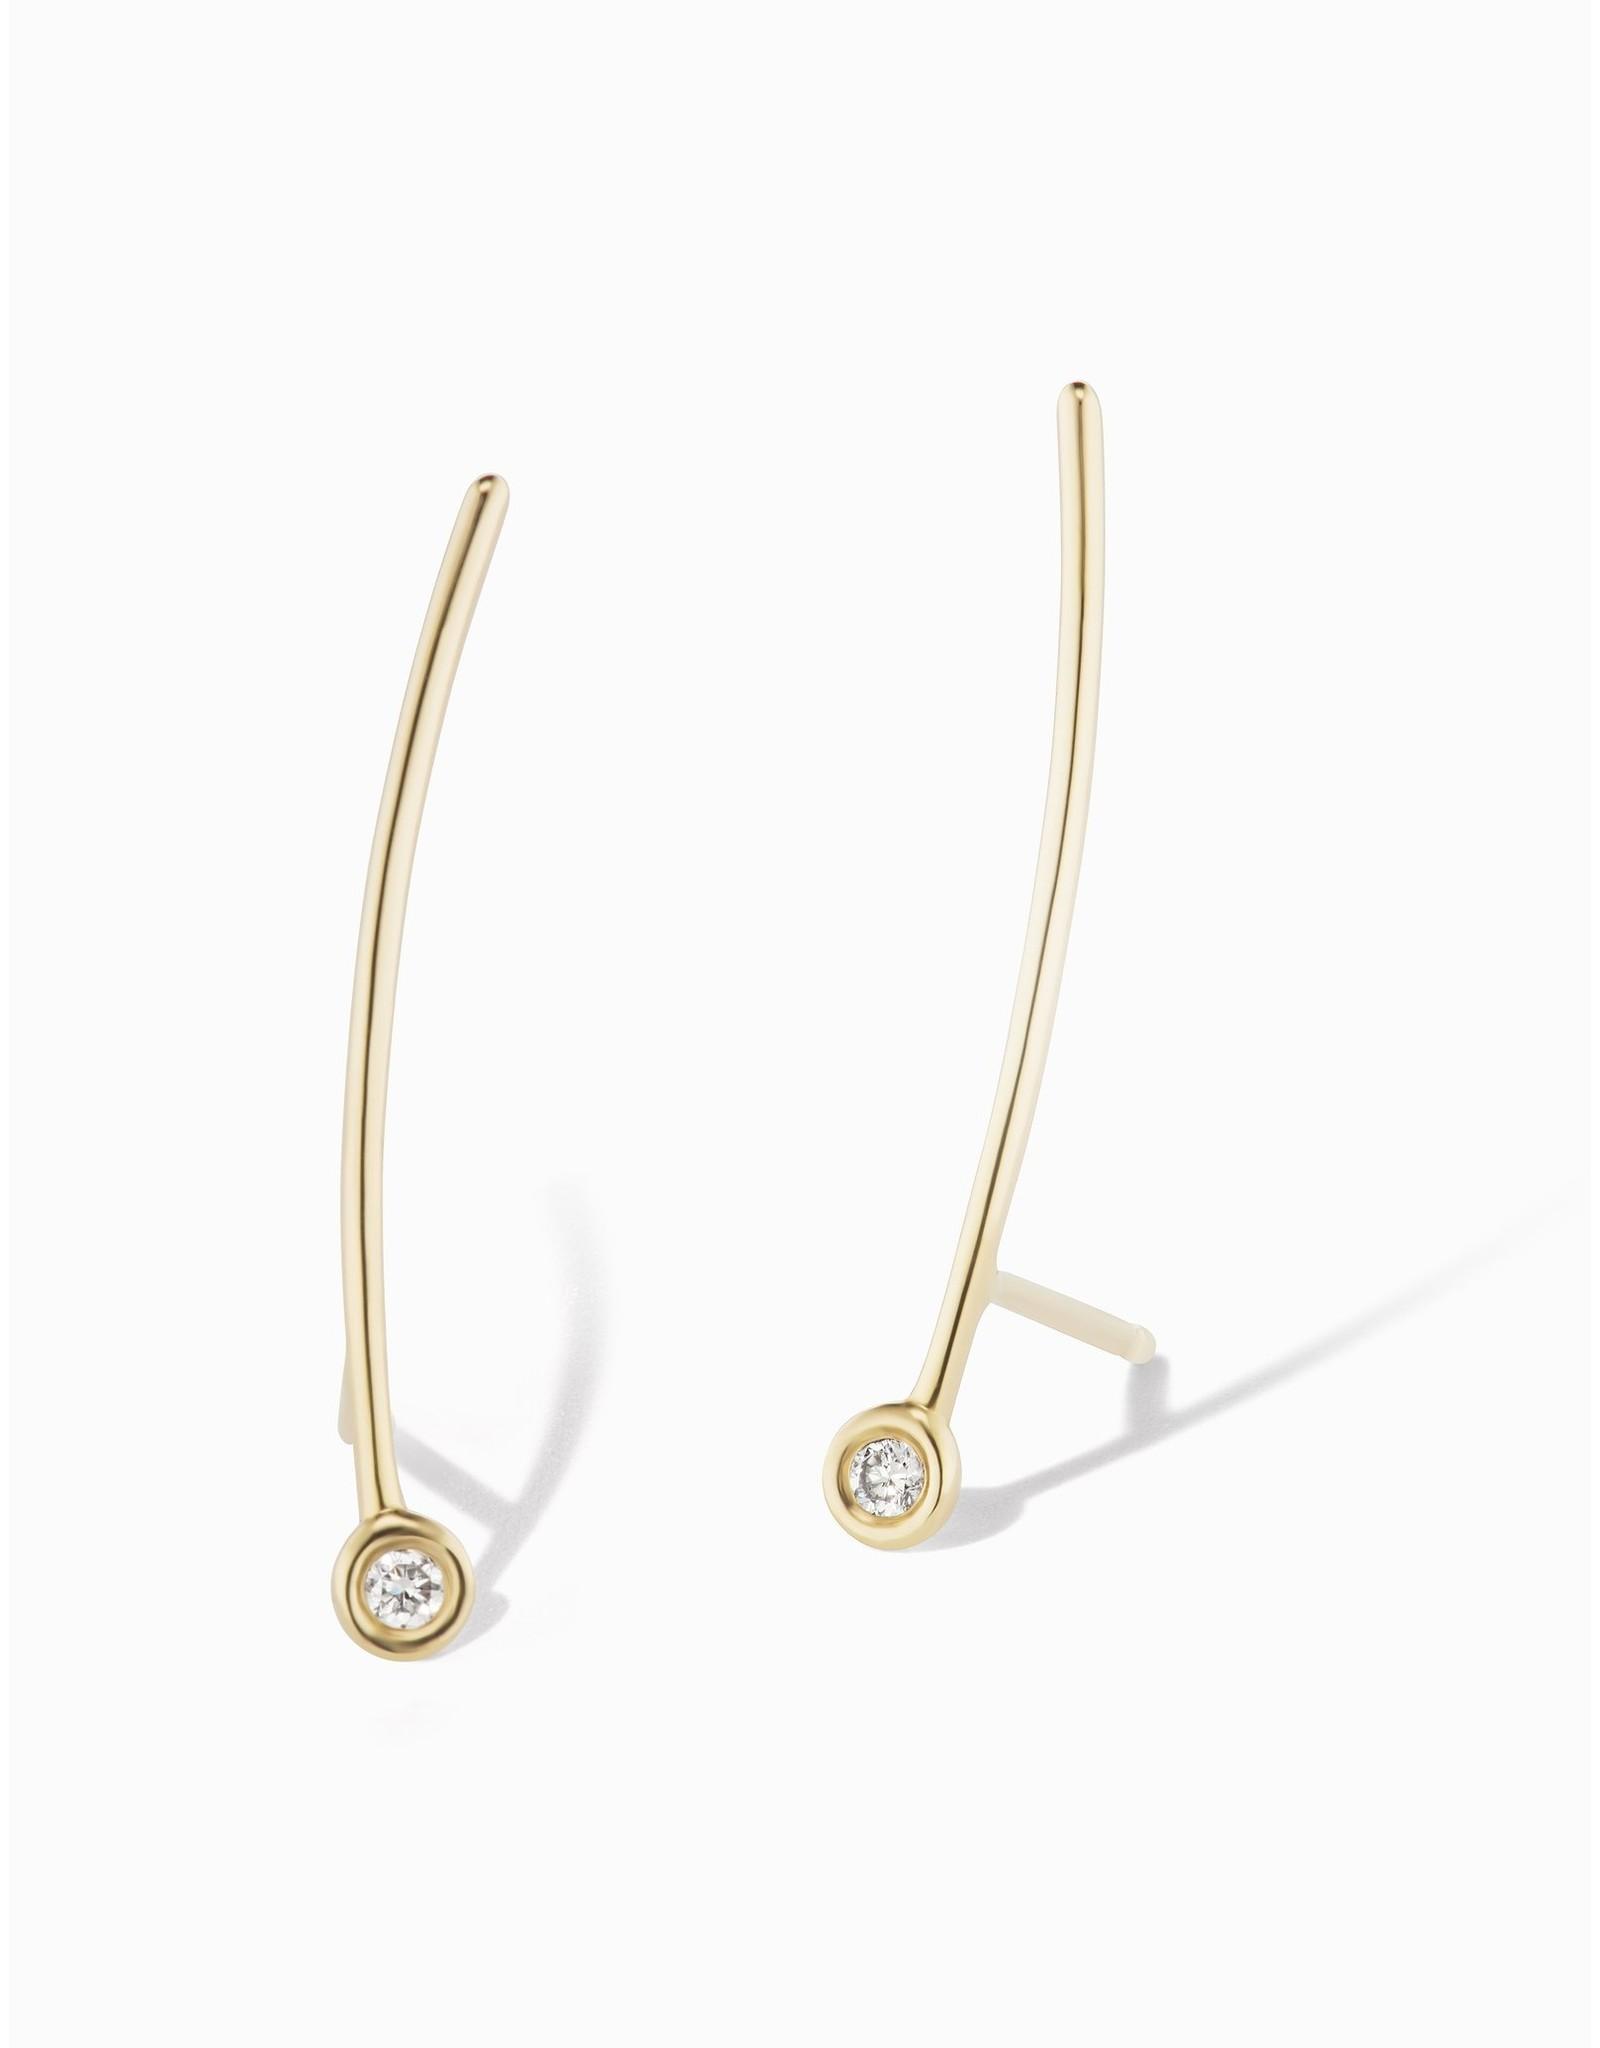 Sophie Ratner Sophie Ratner Diamond Contour Earrings - Yellow Gold / White Diamond